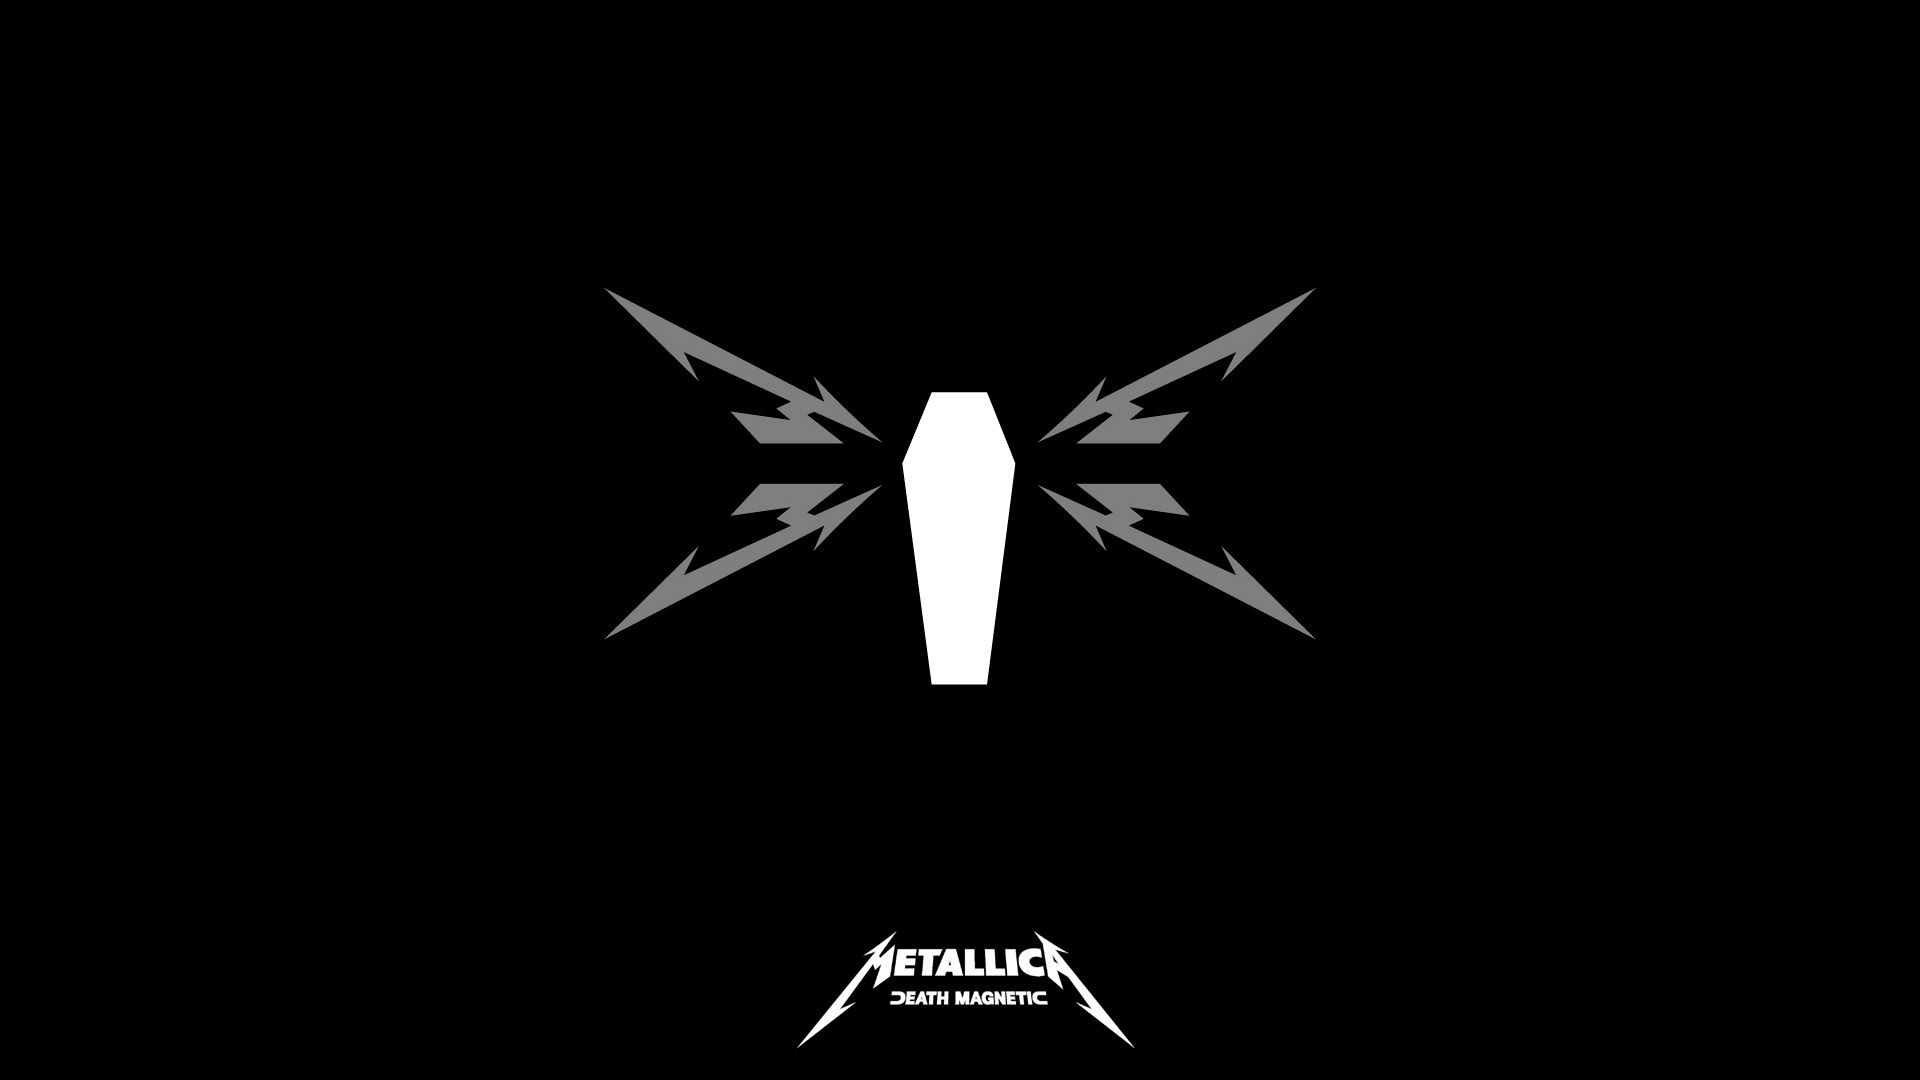 Download Wallpaper 1920x1080 Metallica Symbol Name Background Picture Full Hd 1080p Hd Background Metallica Black Wallpaper Iphone Wallpaper